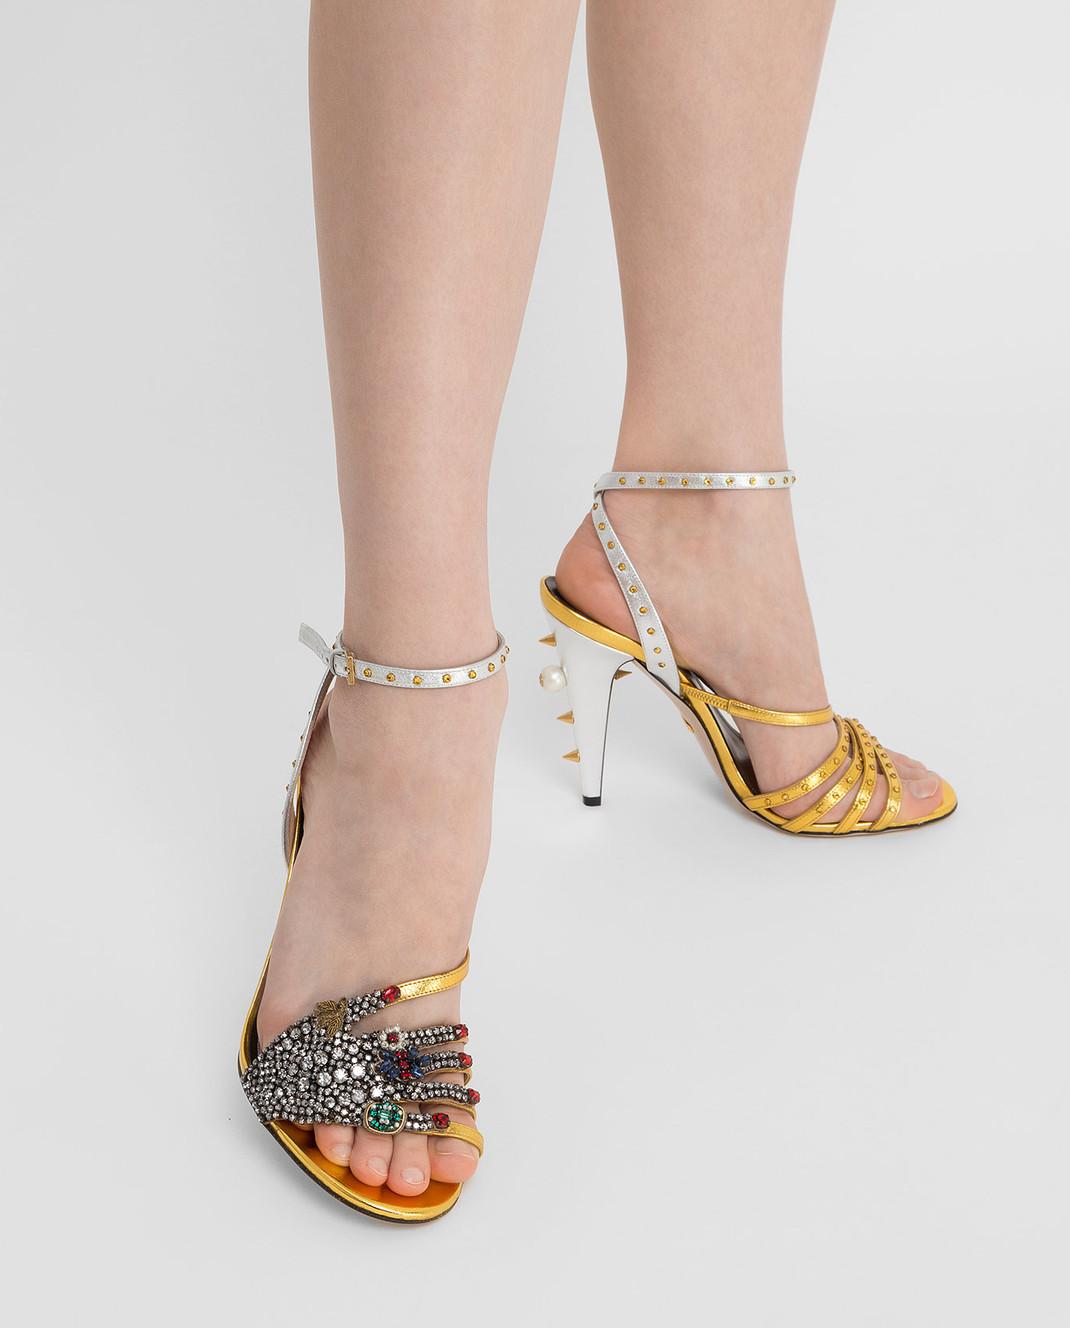 Gucci Босоножки с кристаллами 452770 изображение 2